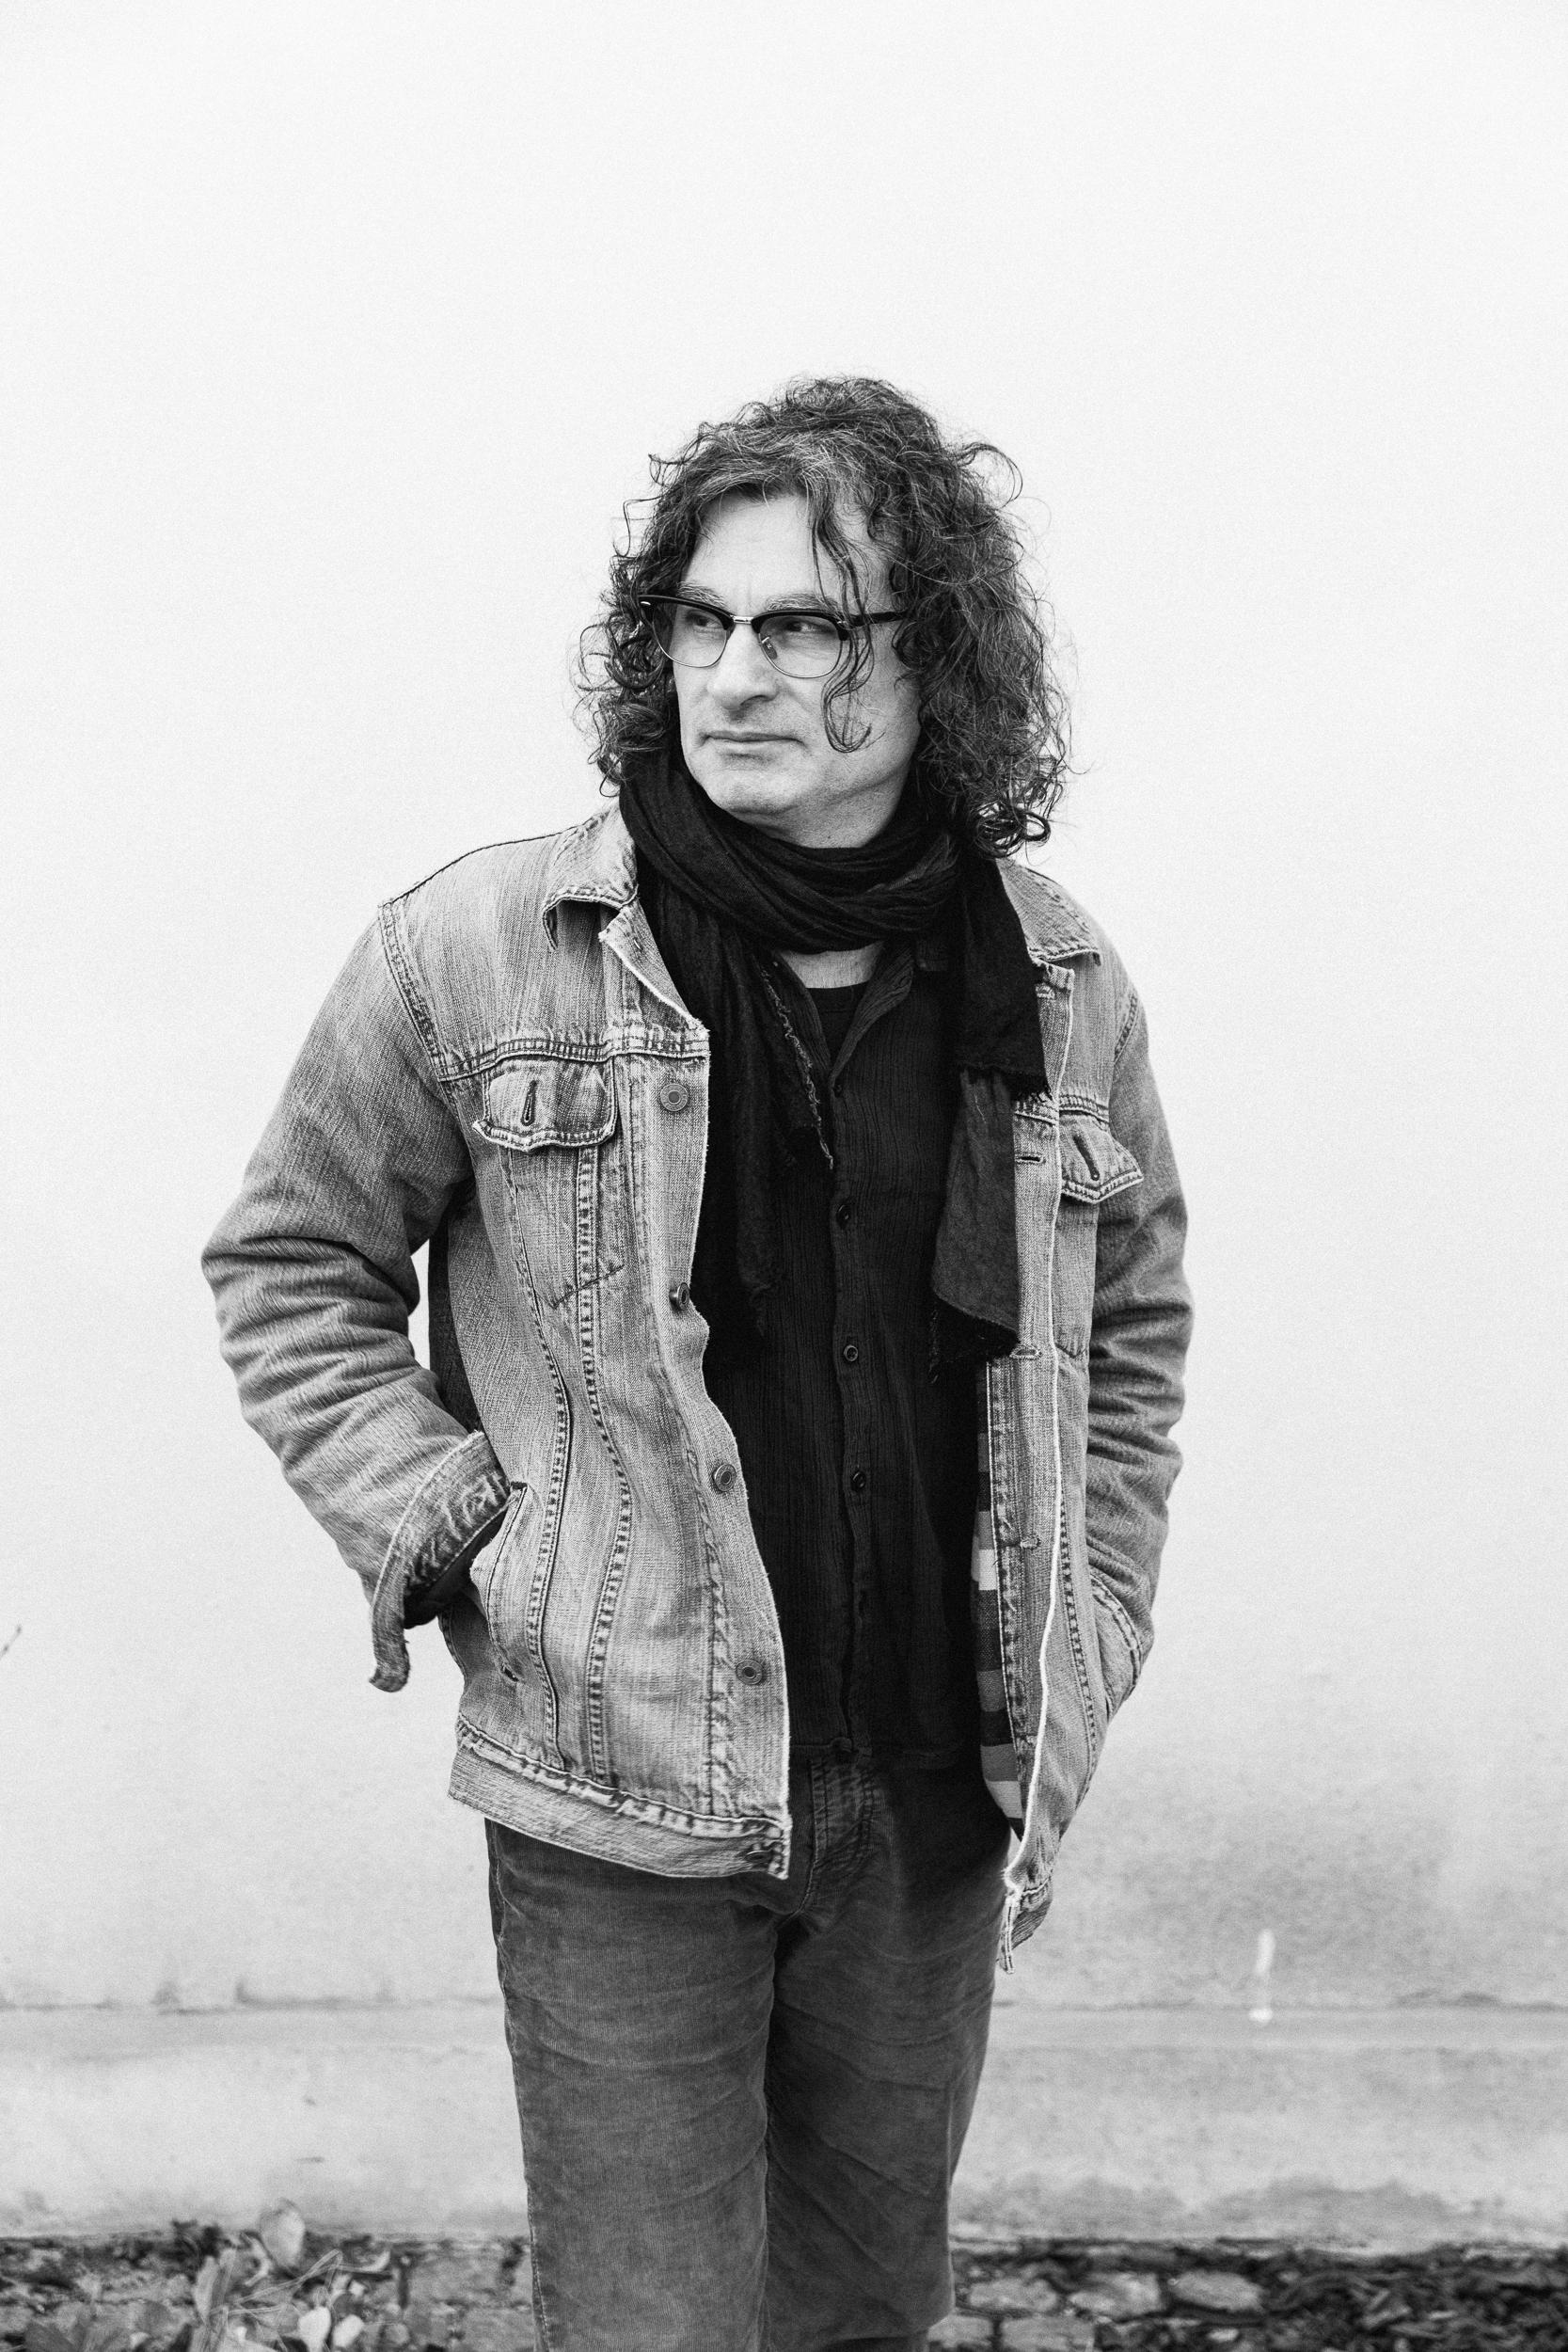 Director Ziad Doueiri